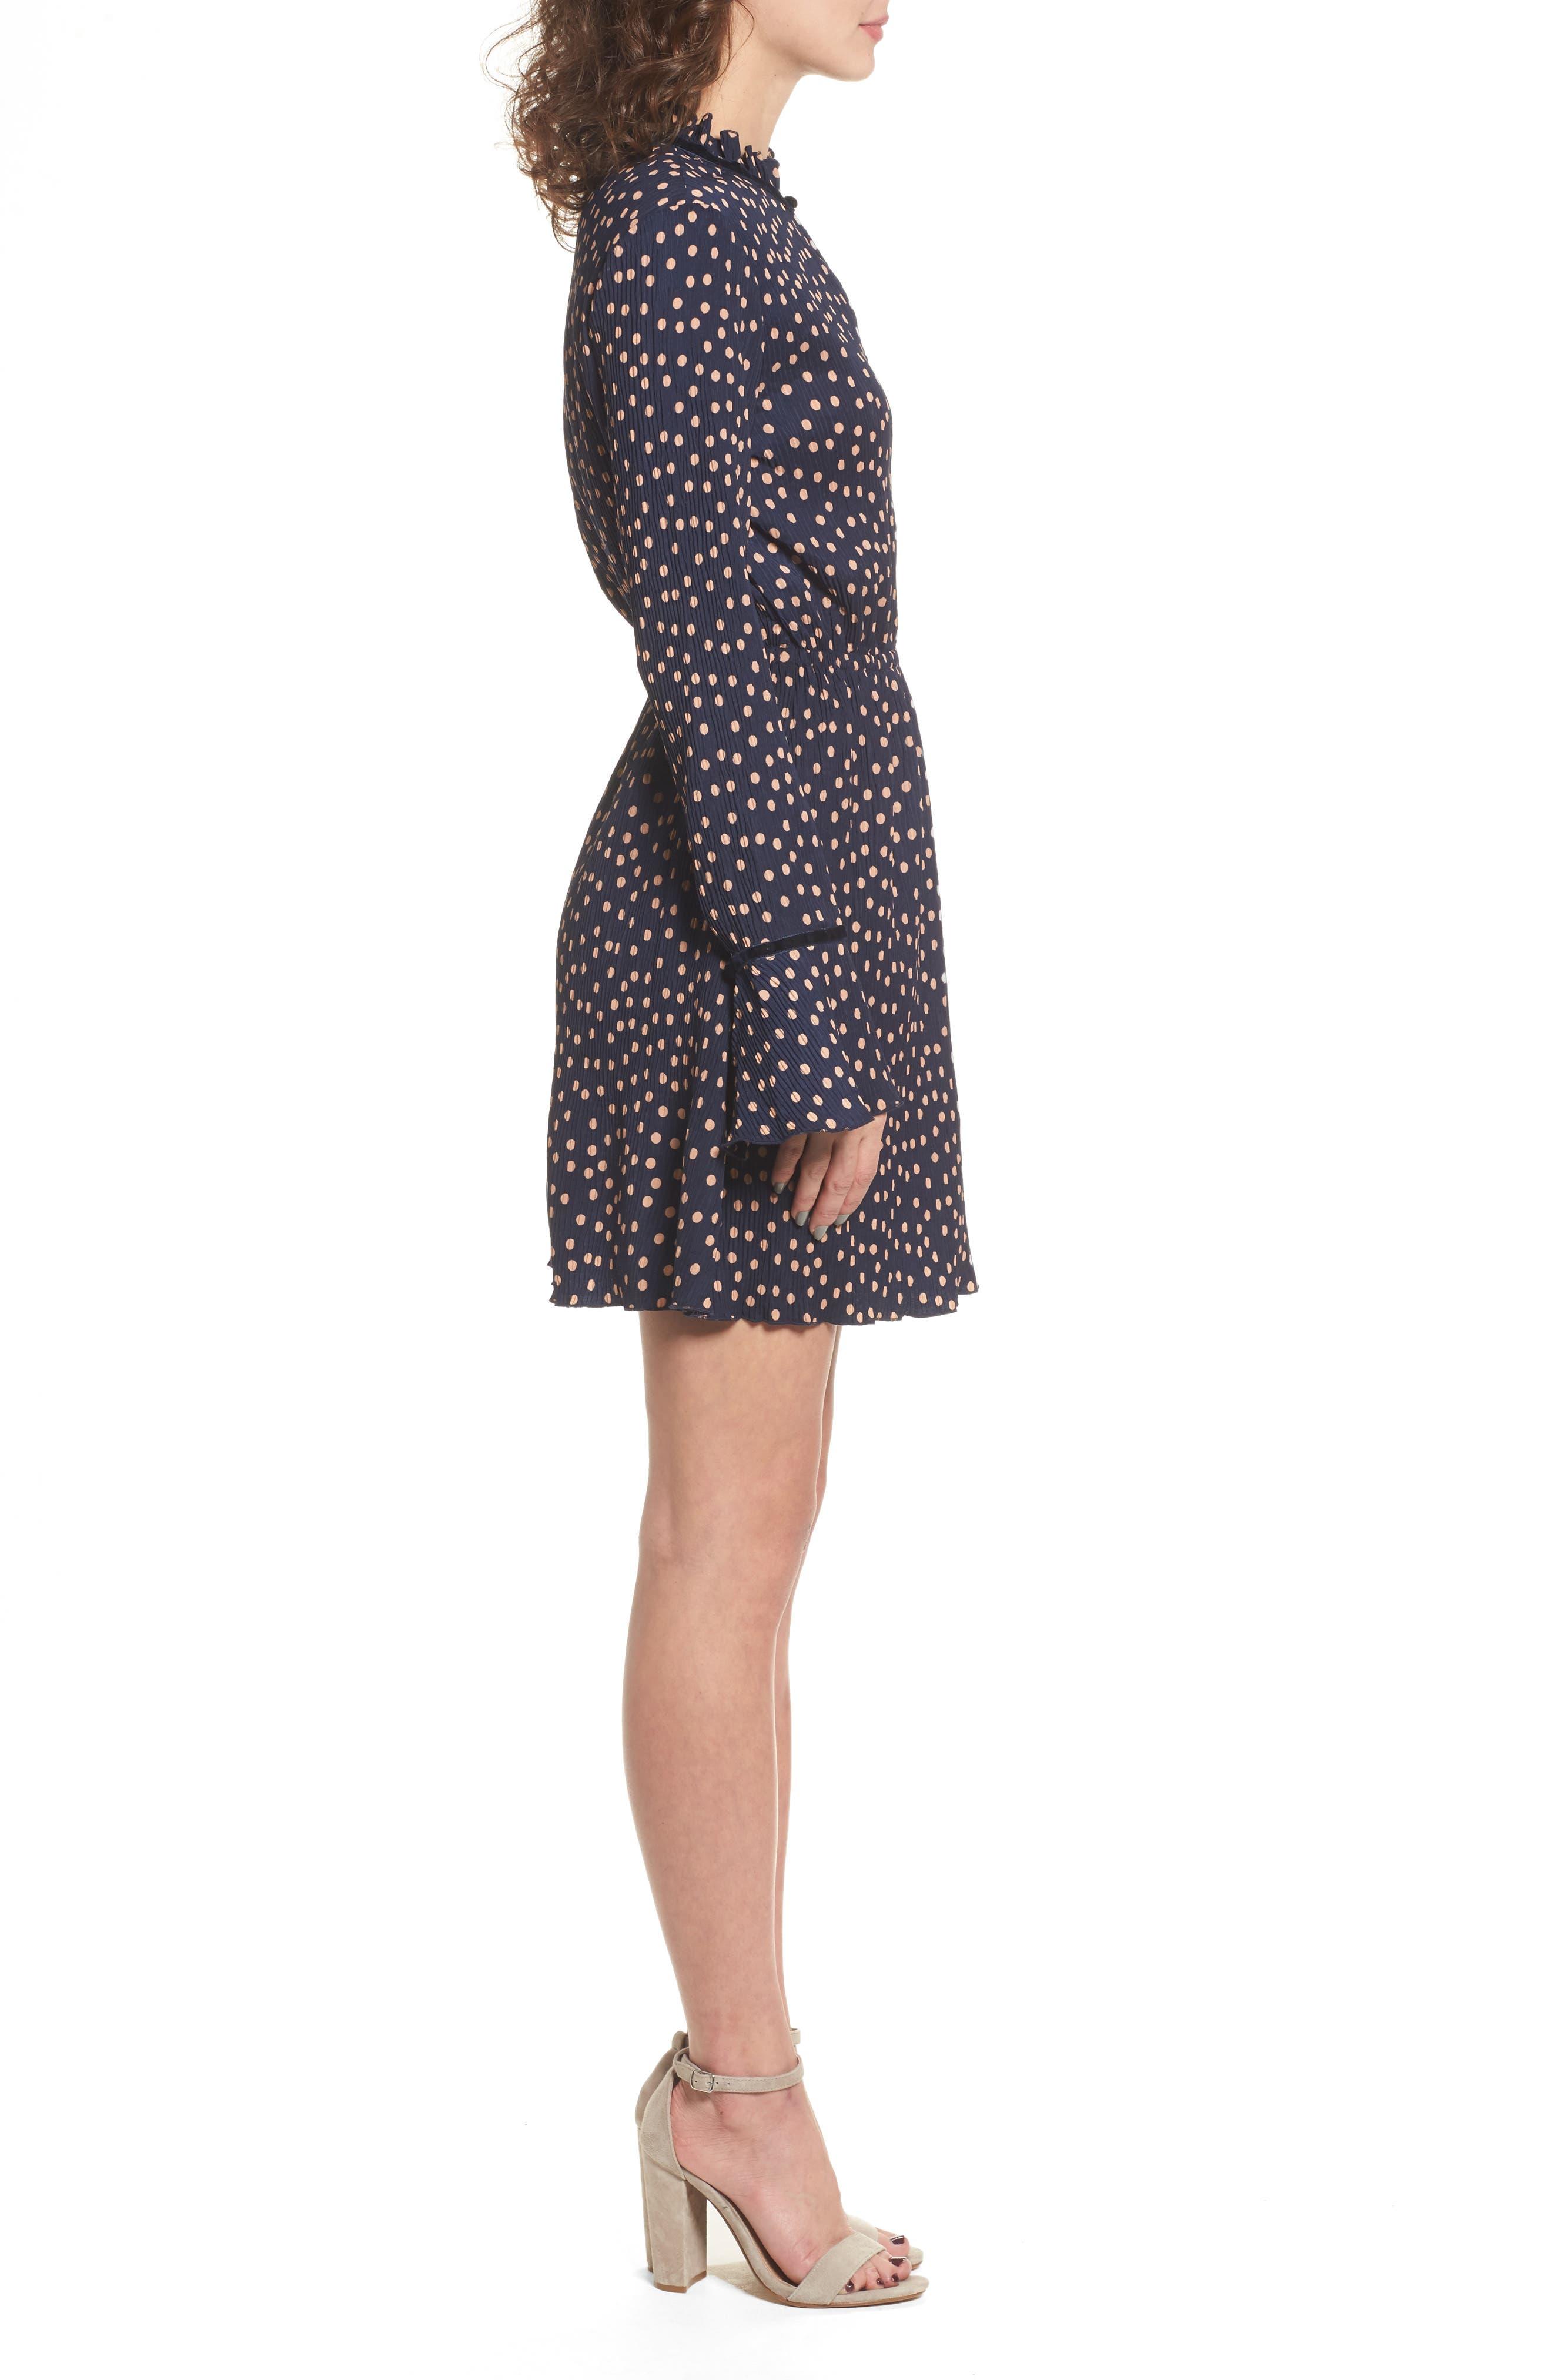 Atlanta Dress,                             Alternate thumbnail 4, color,                             Navy W Peach